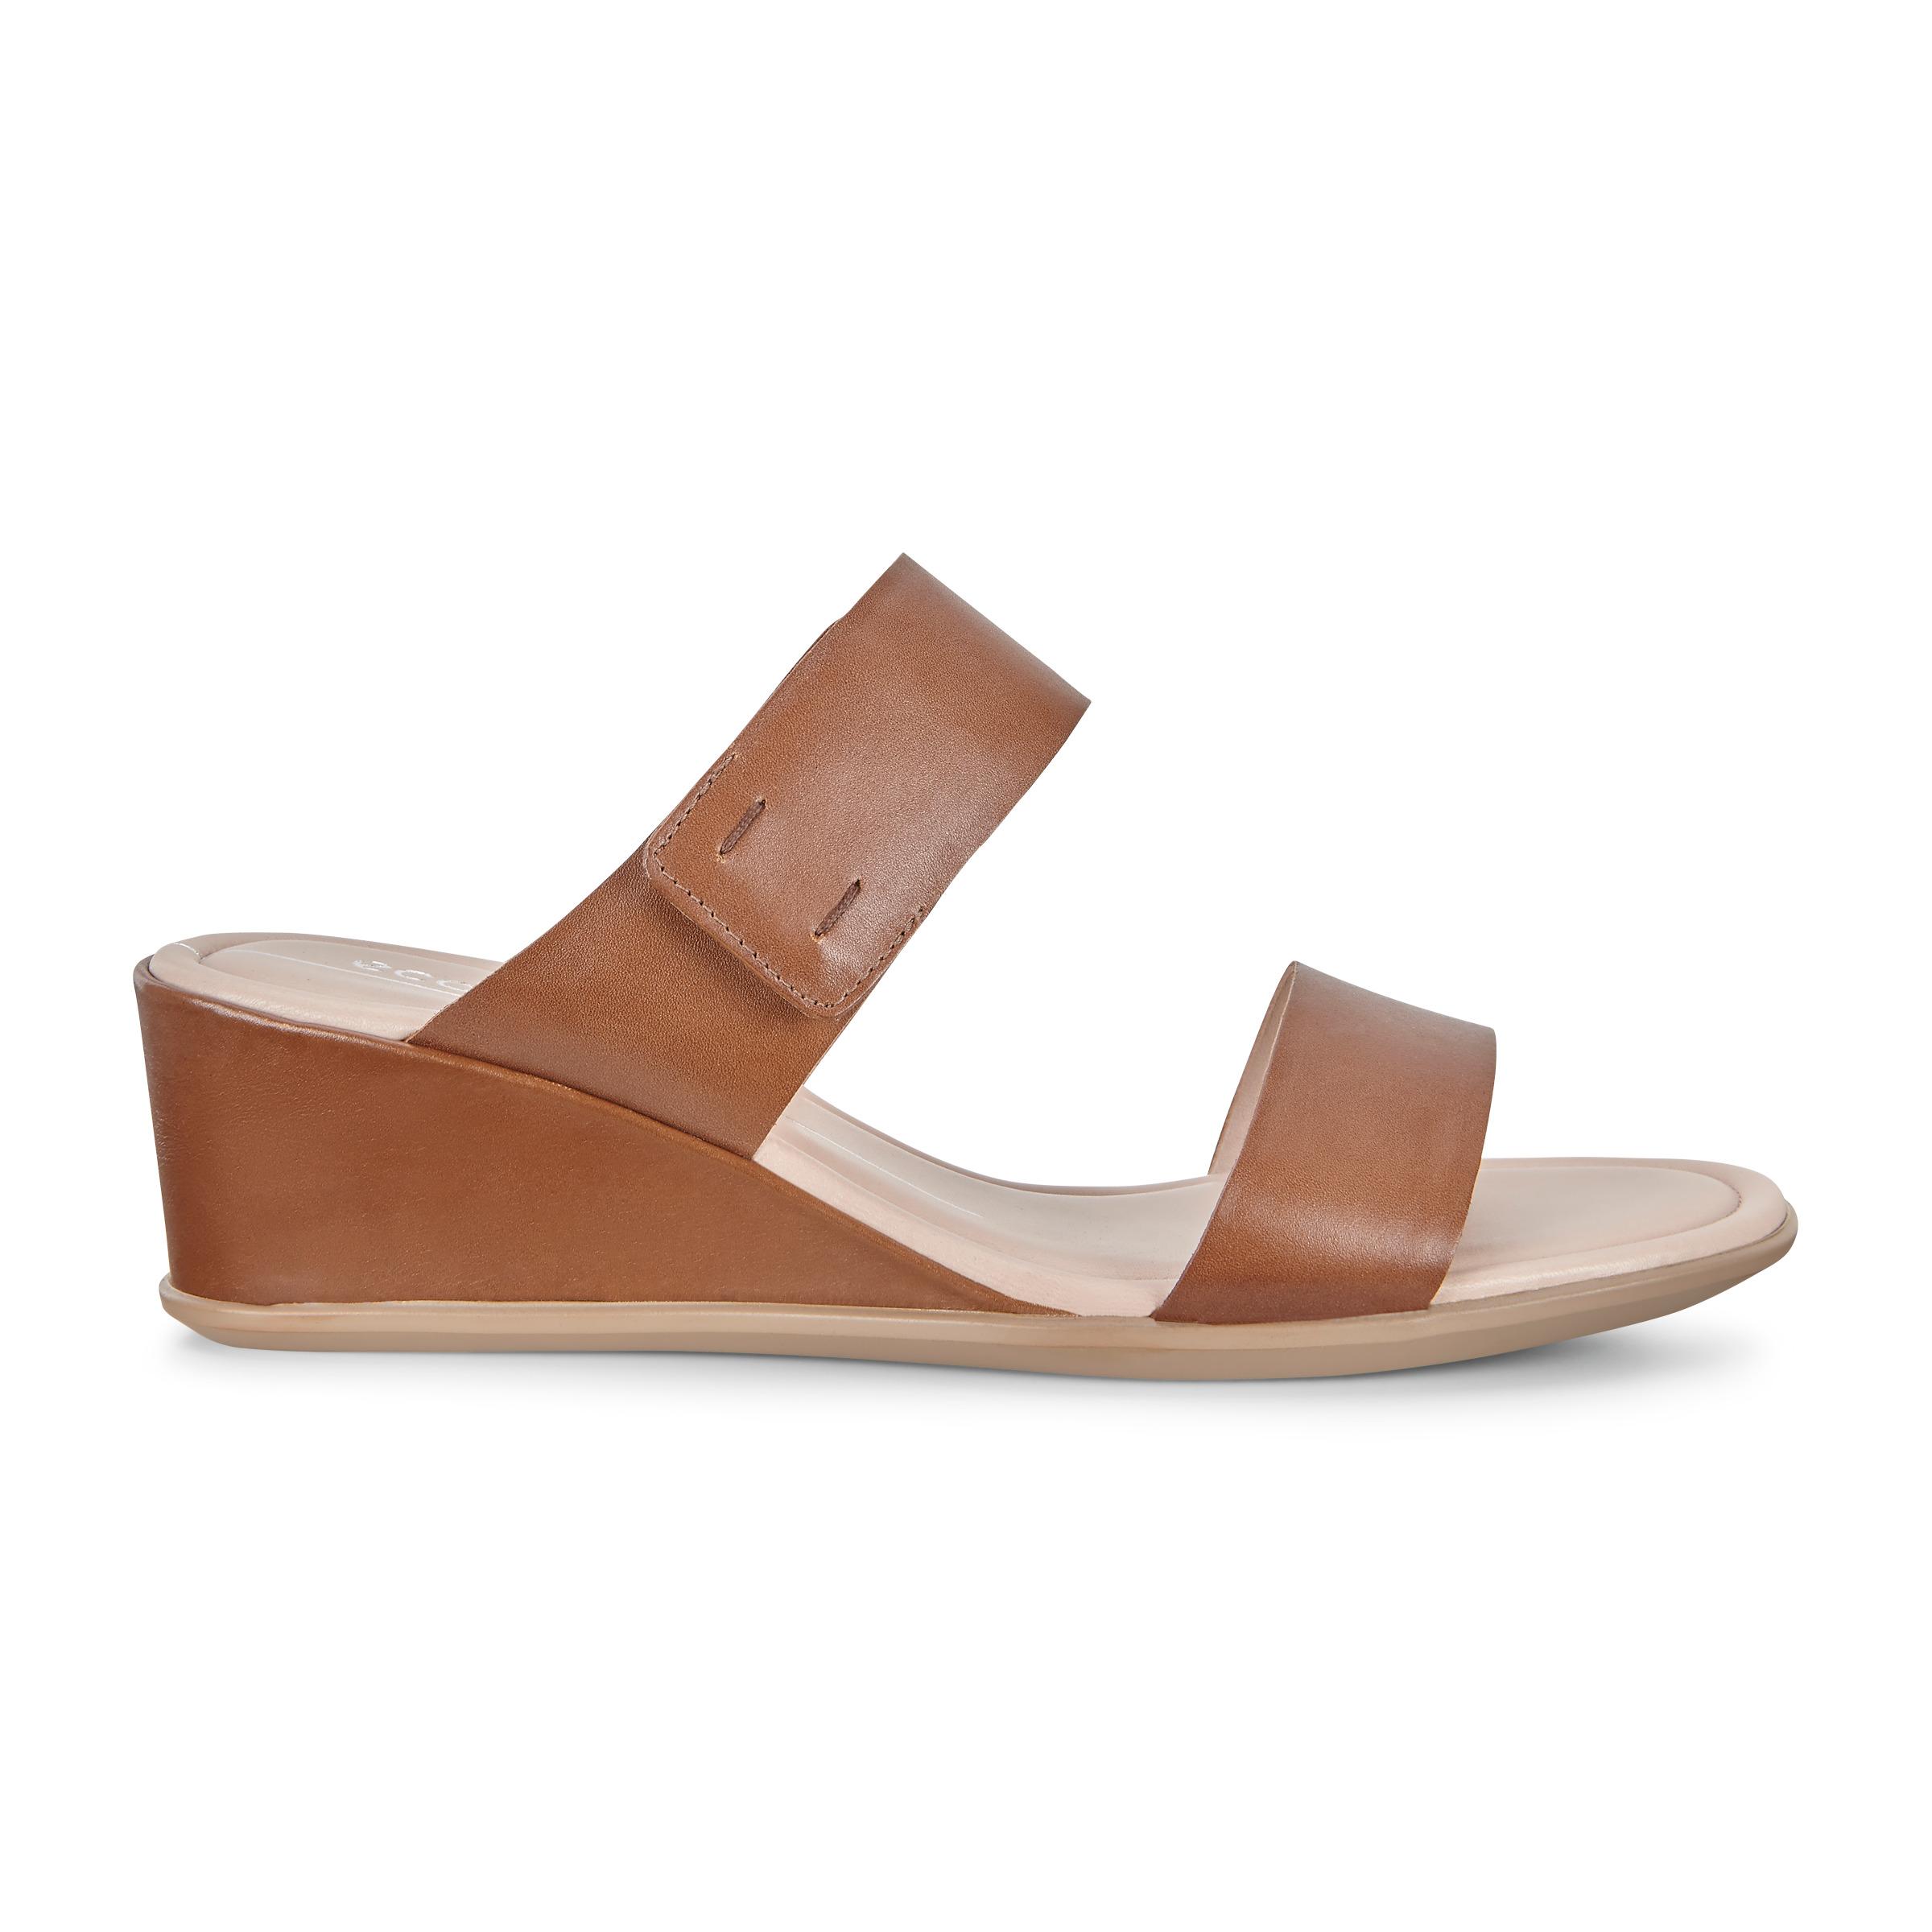 ECCO Shape 35 Wedge 2-strap Sandals Size 7-7.5 Camel